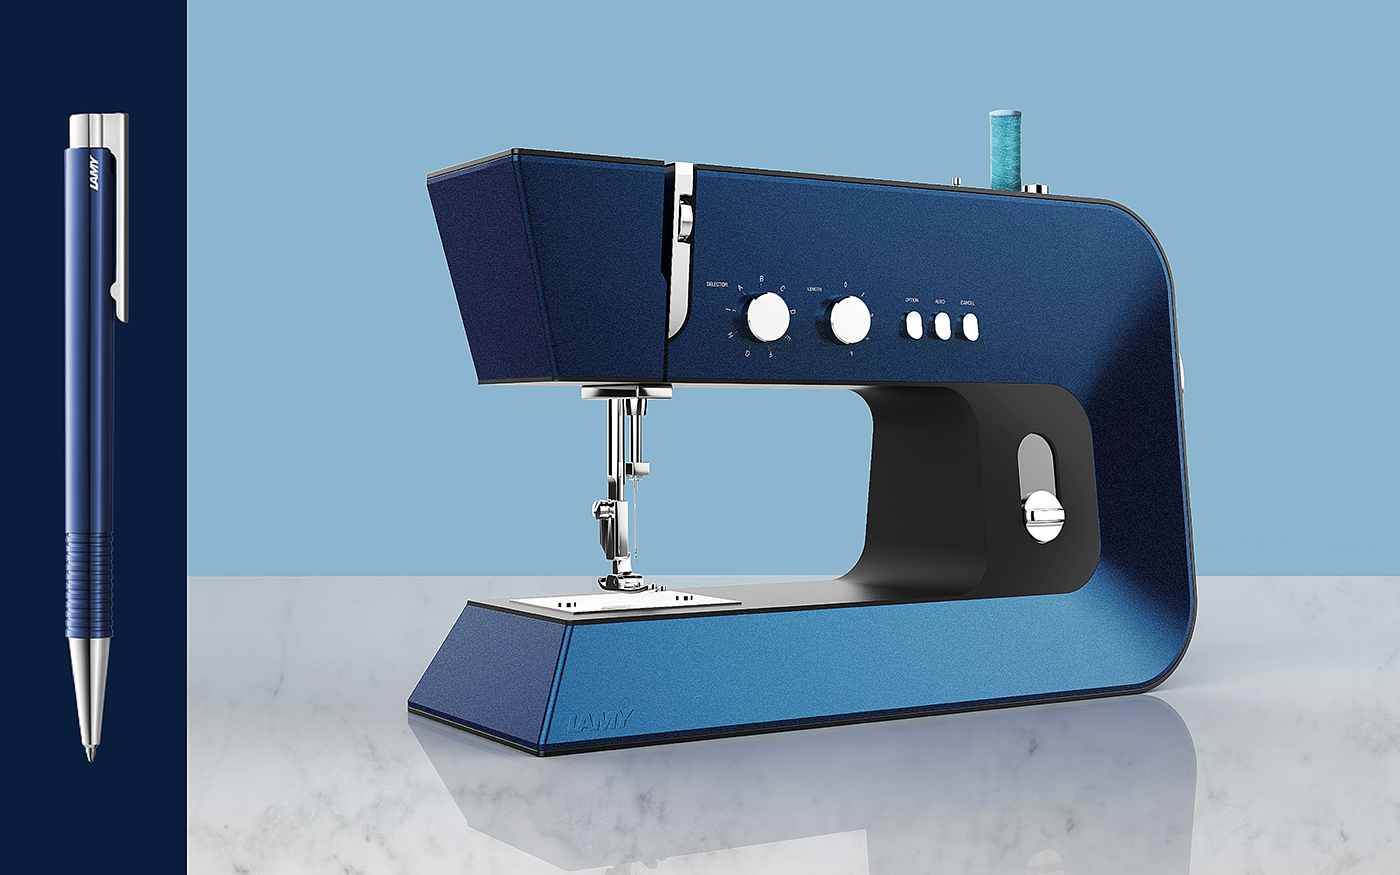 sewing machine lamy pen design color metal